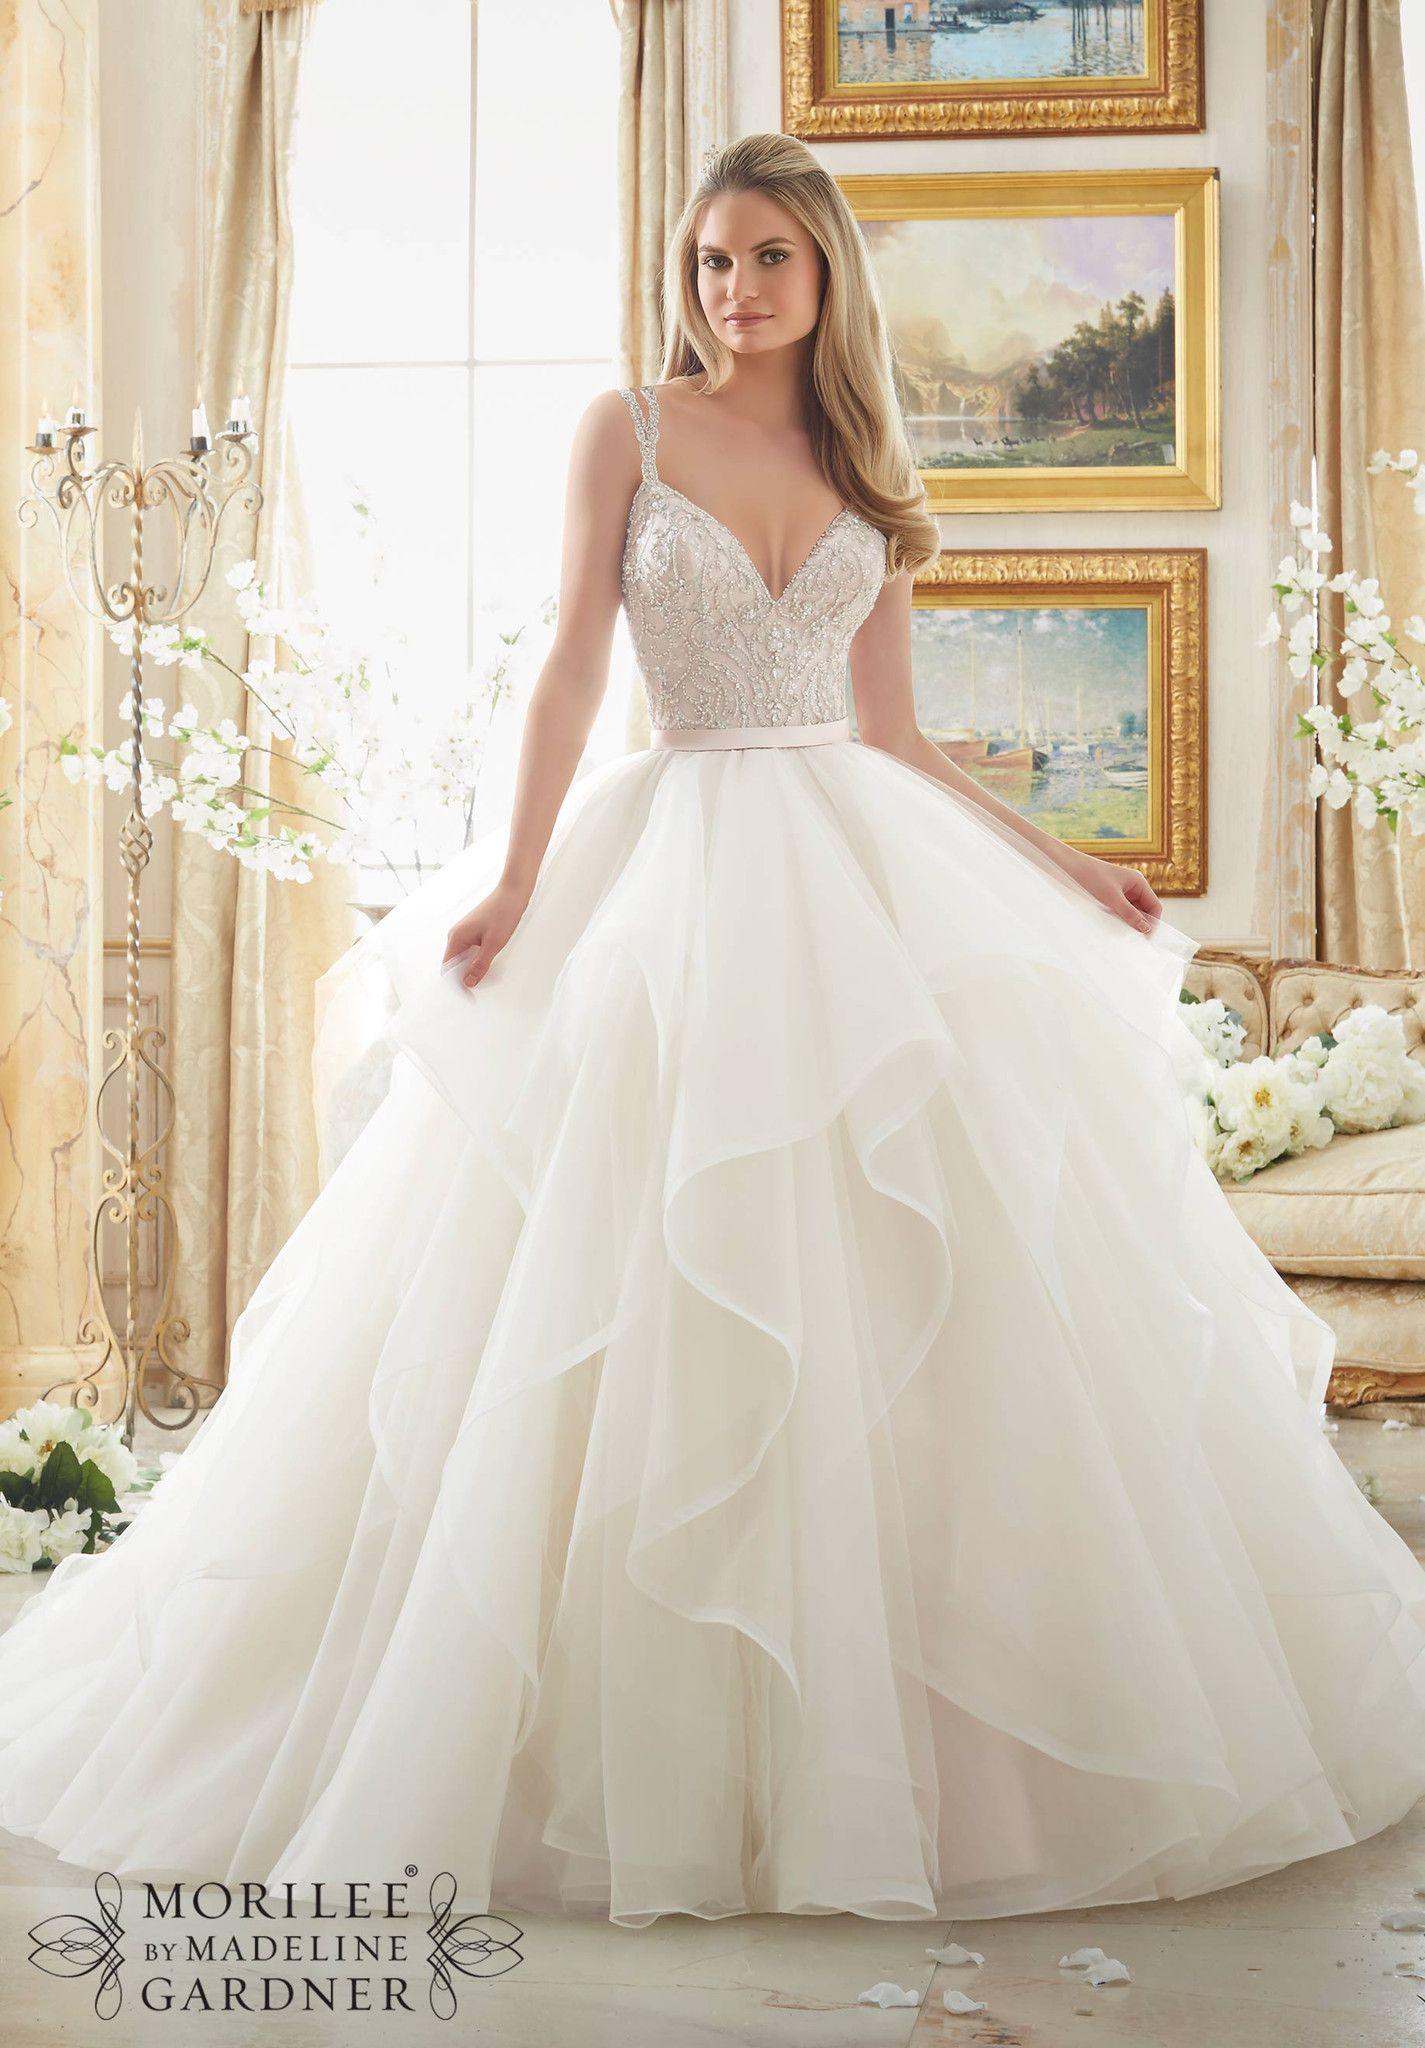 Mori Lee - 2887 - All Dressed Up, Bridal Gown | Mori lee, Bridal ...